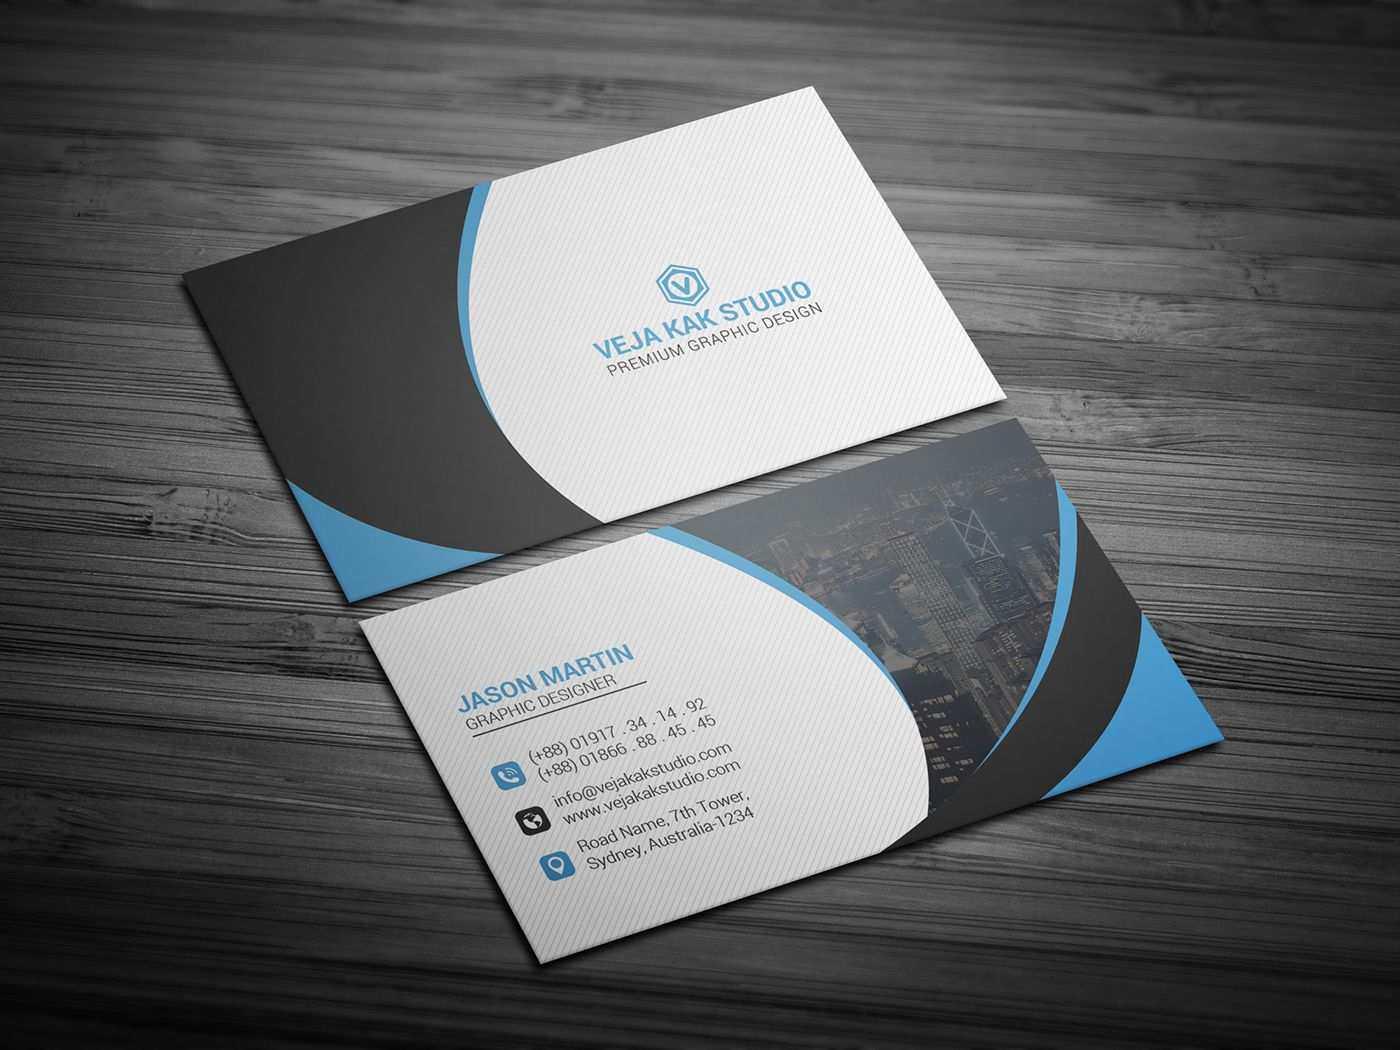 Gartner Business Card Template 61797 - Cards Design Templates For Gartner Business Cards Template